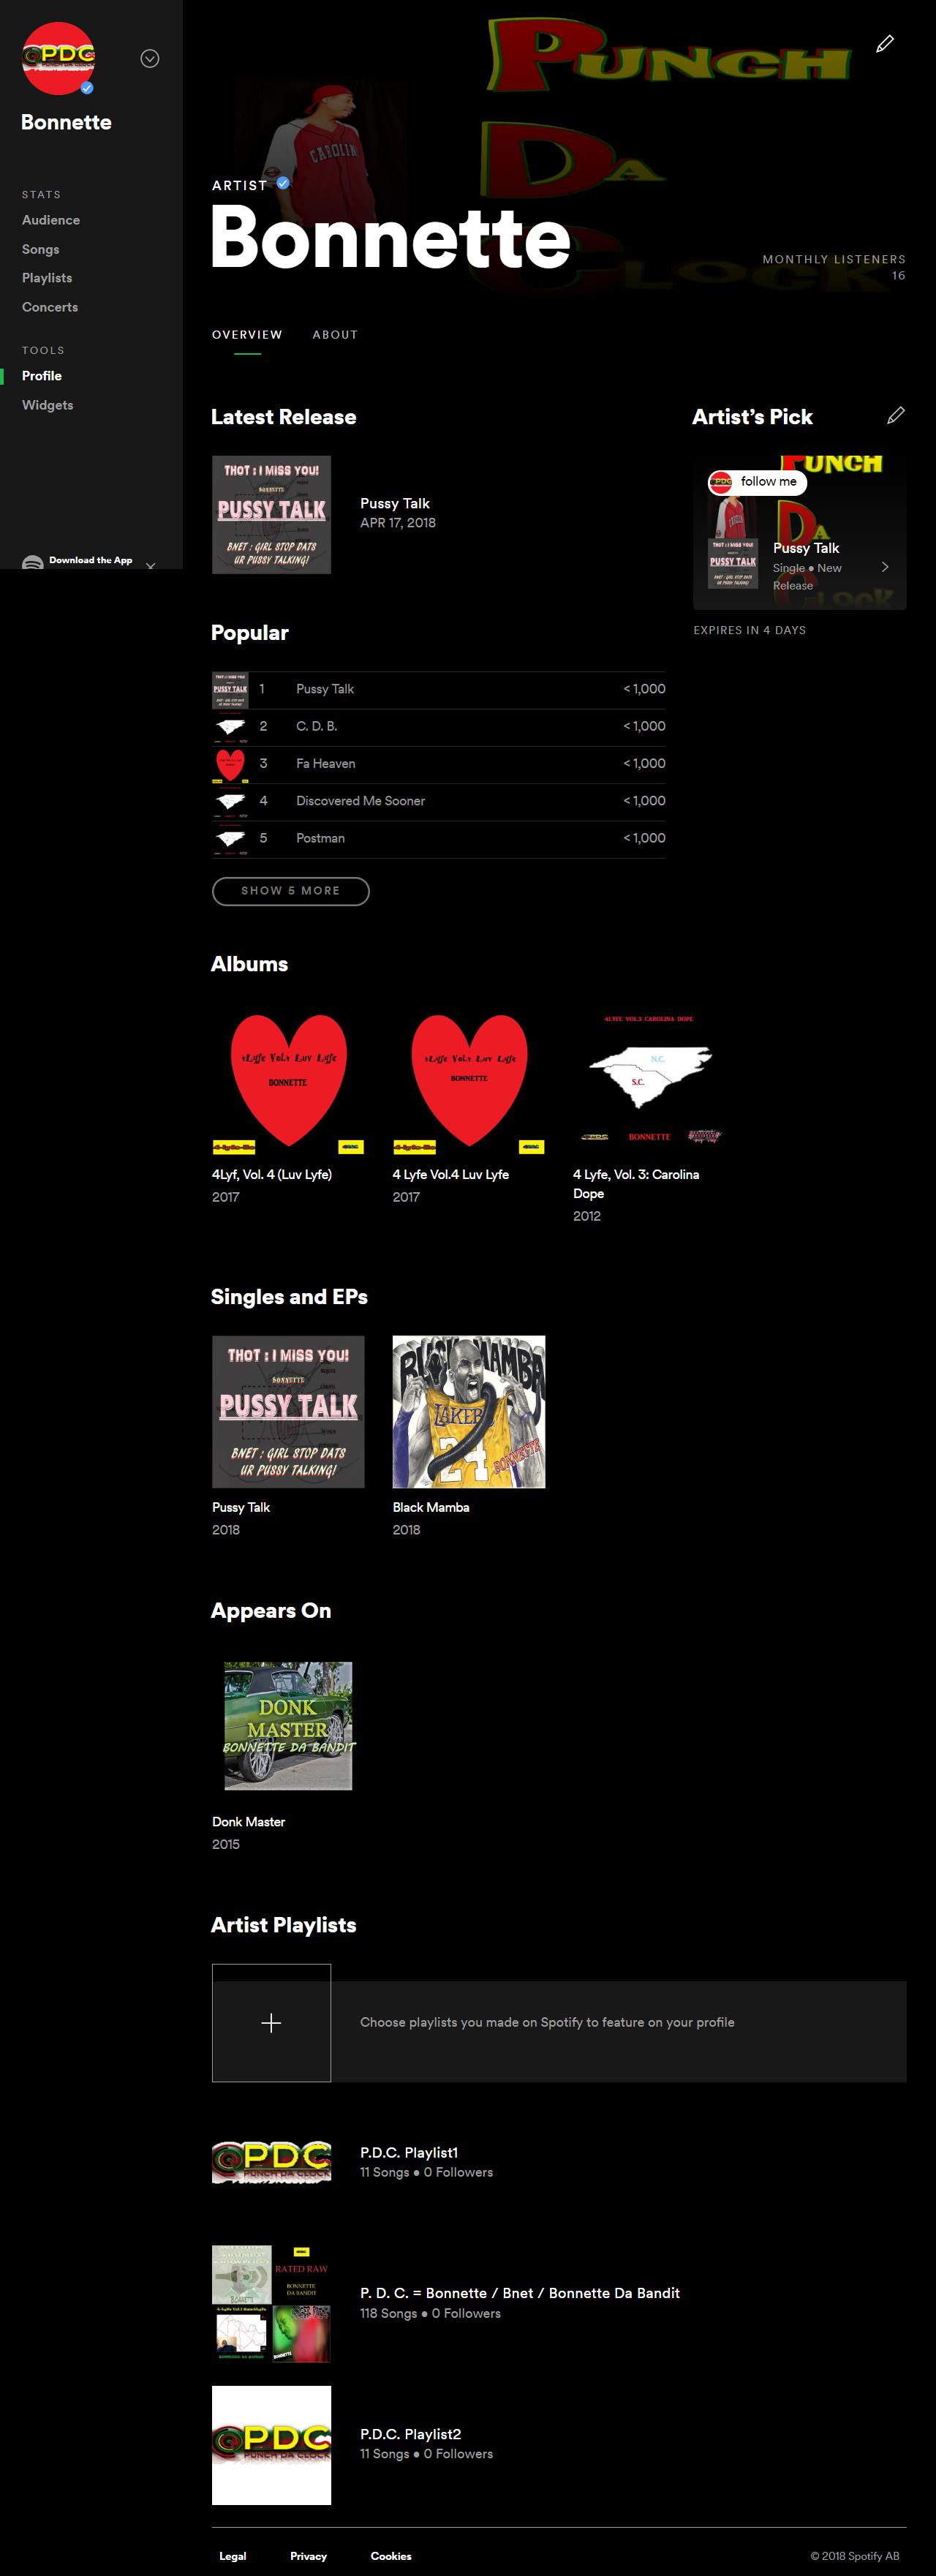 Bonnette Artist Profile – Spotify https://open.spotify.com/user/bnet803/playlist/0vTdPtwwpD3aR6ENSn6Ggj?si=EylVGLLZRZeSQCUhi1Y-oQ